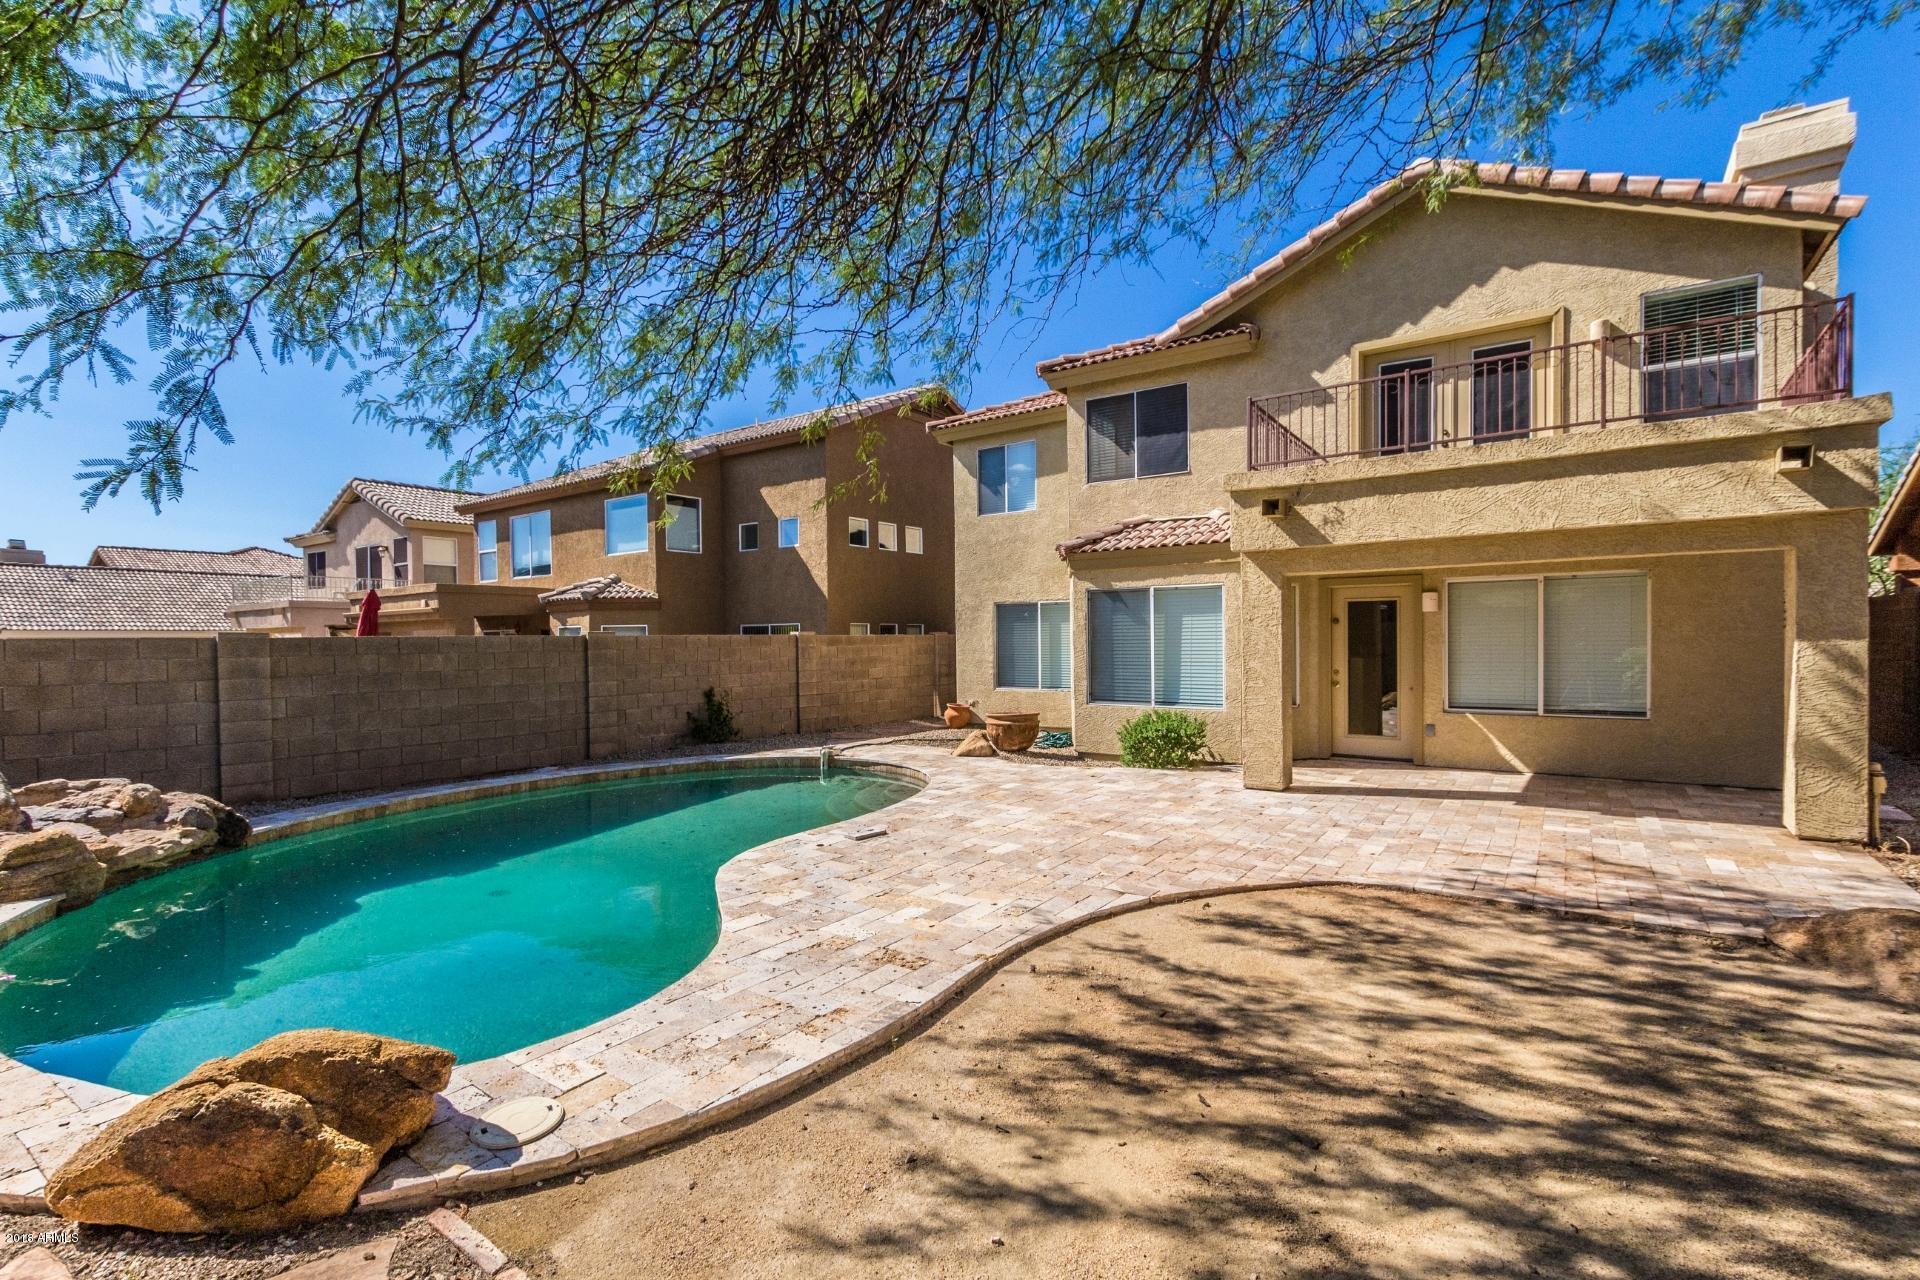 MLS 5834937 31223 N 43RD Street, Cave Creek, AZ 85331 Cave Creek AZ Affordable